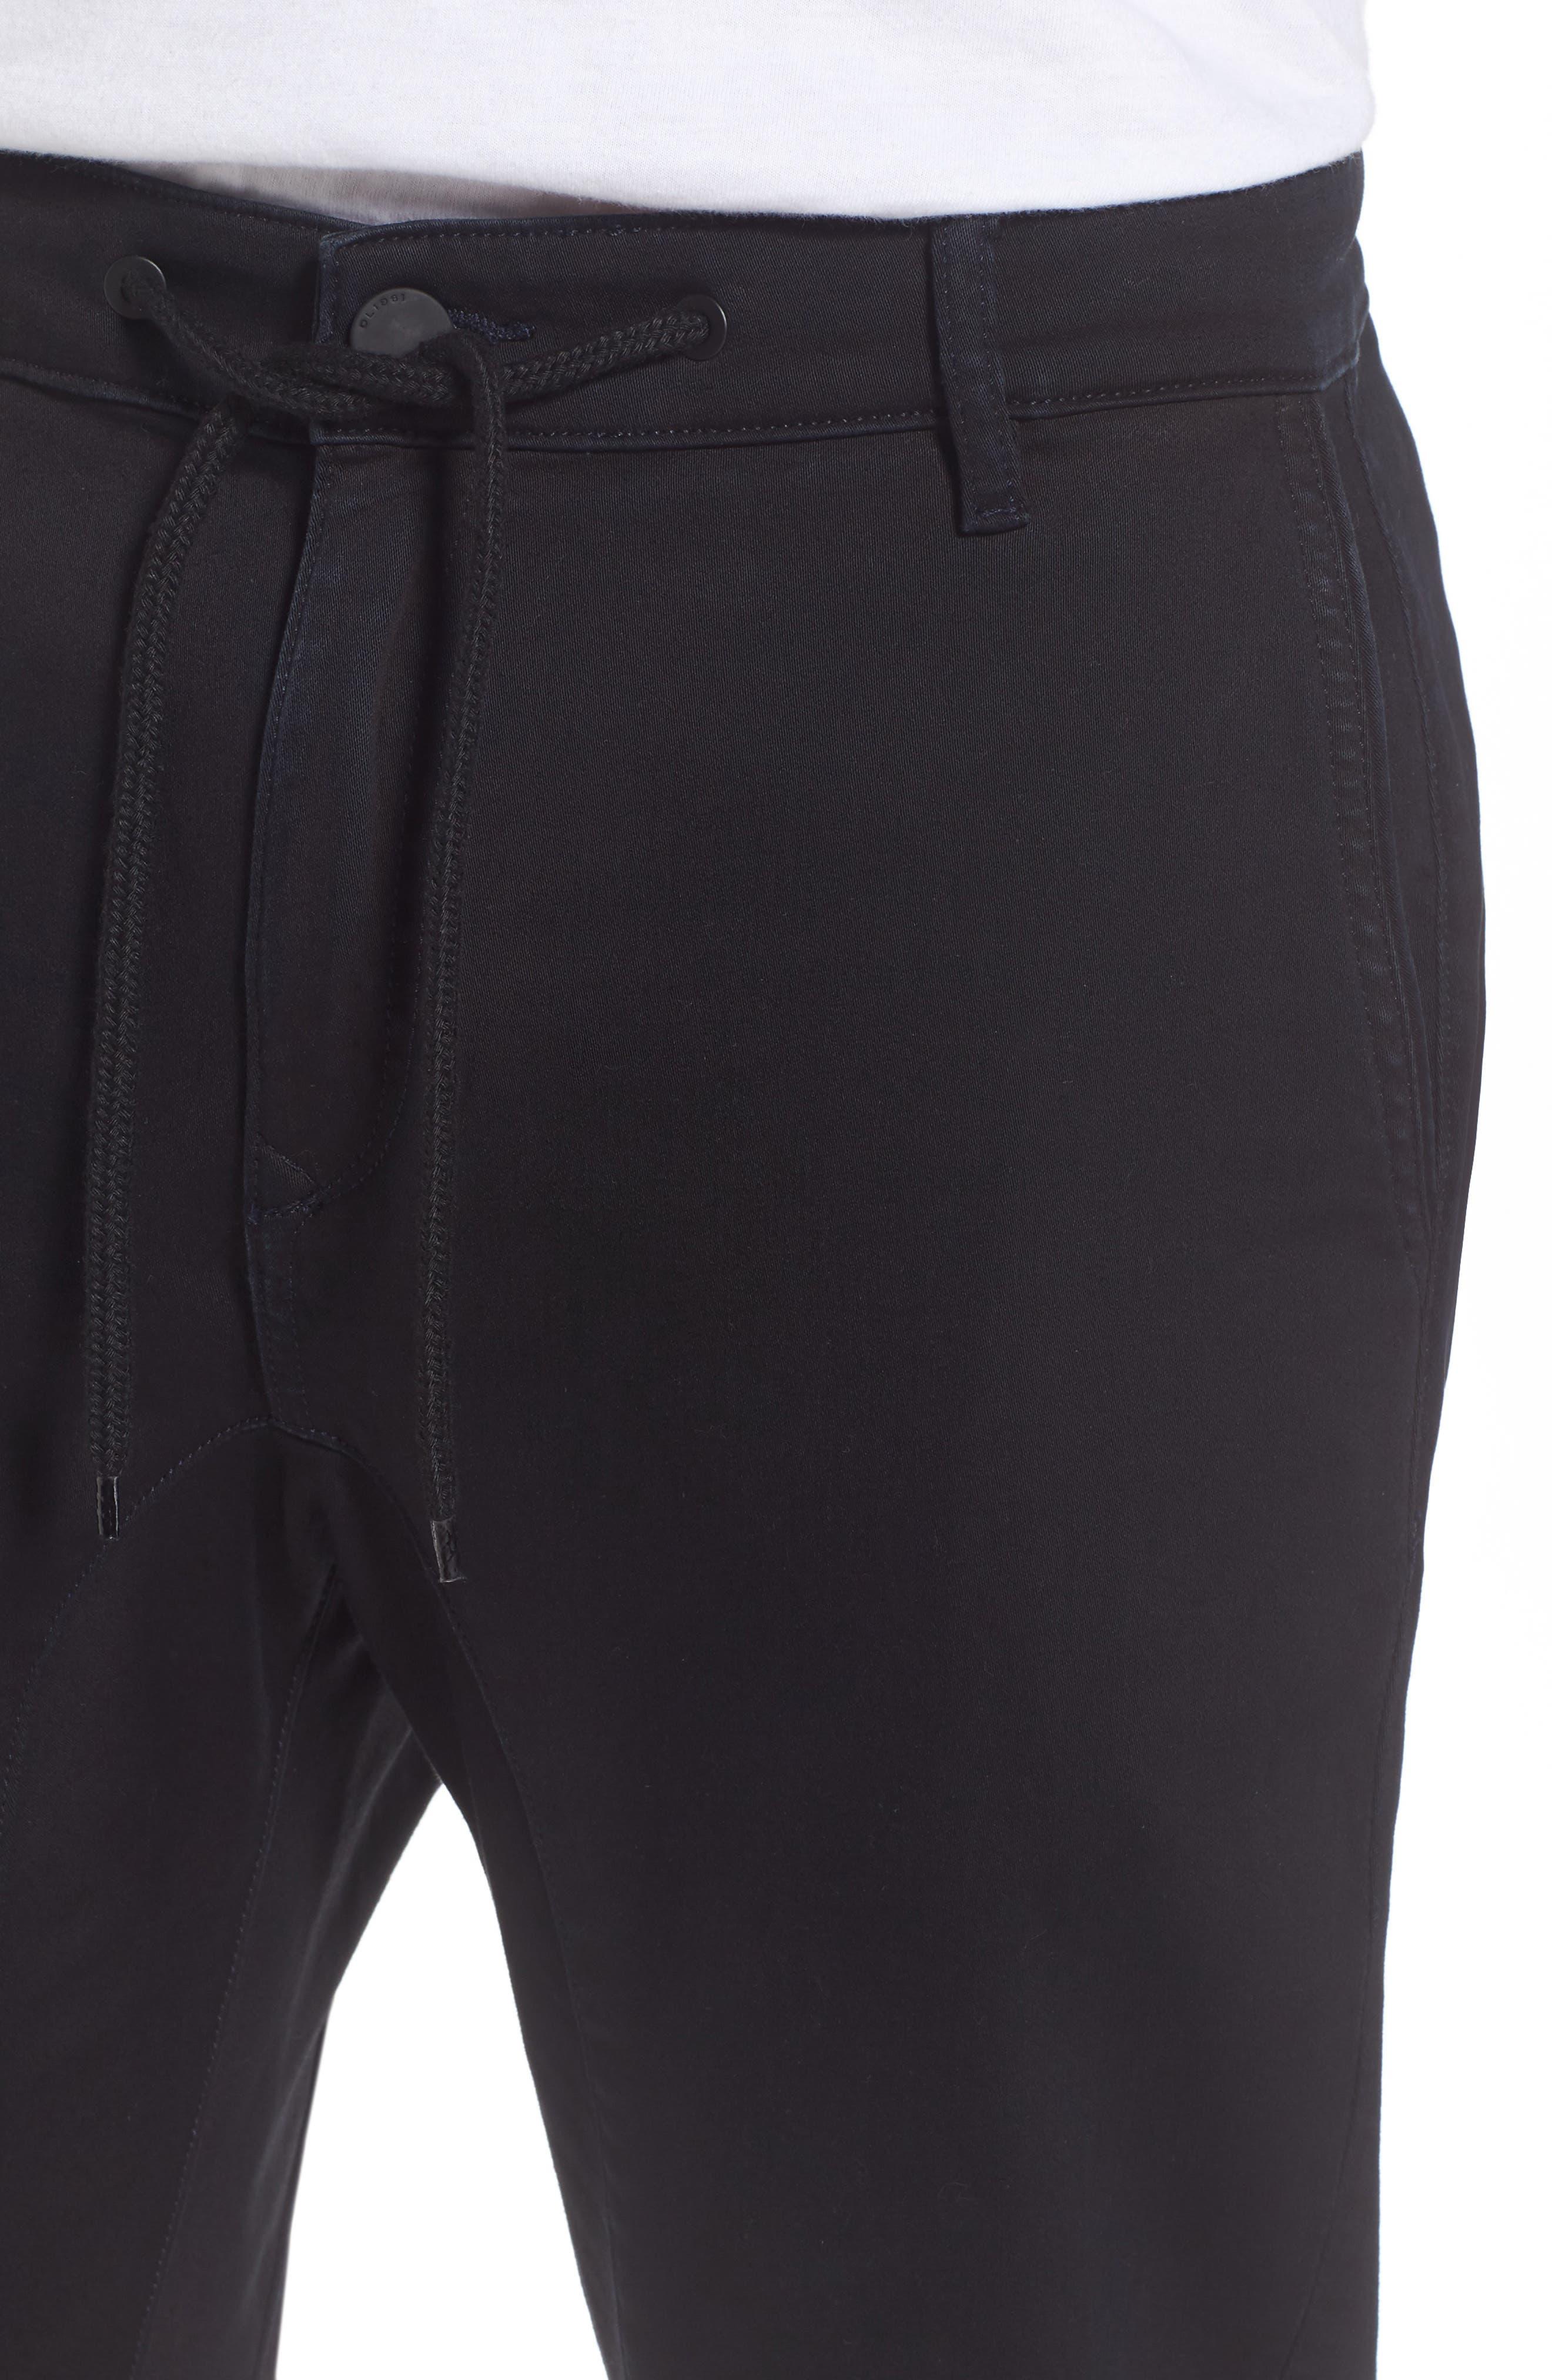 Jay Slim Skinny Fit Jogger Pants,                             Alternate thumbnail 4, color,                             001